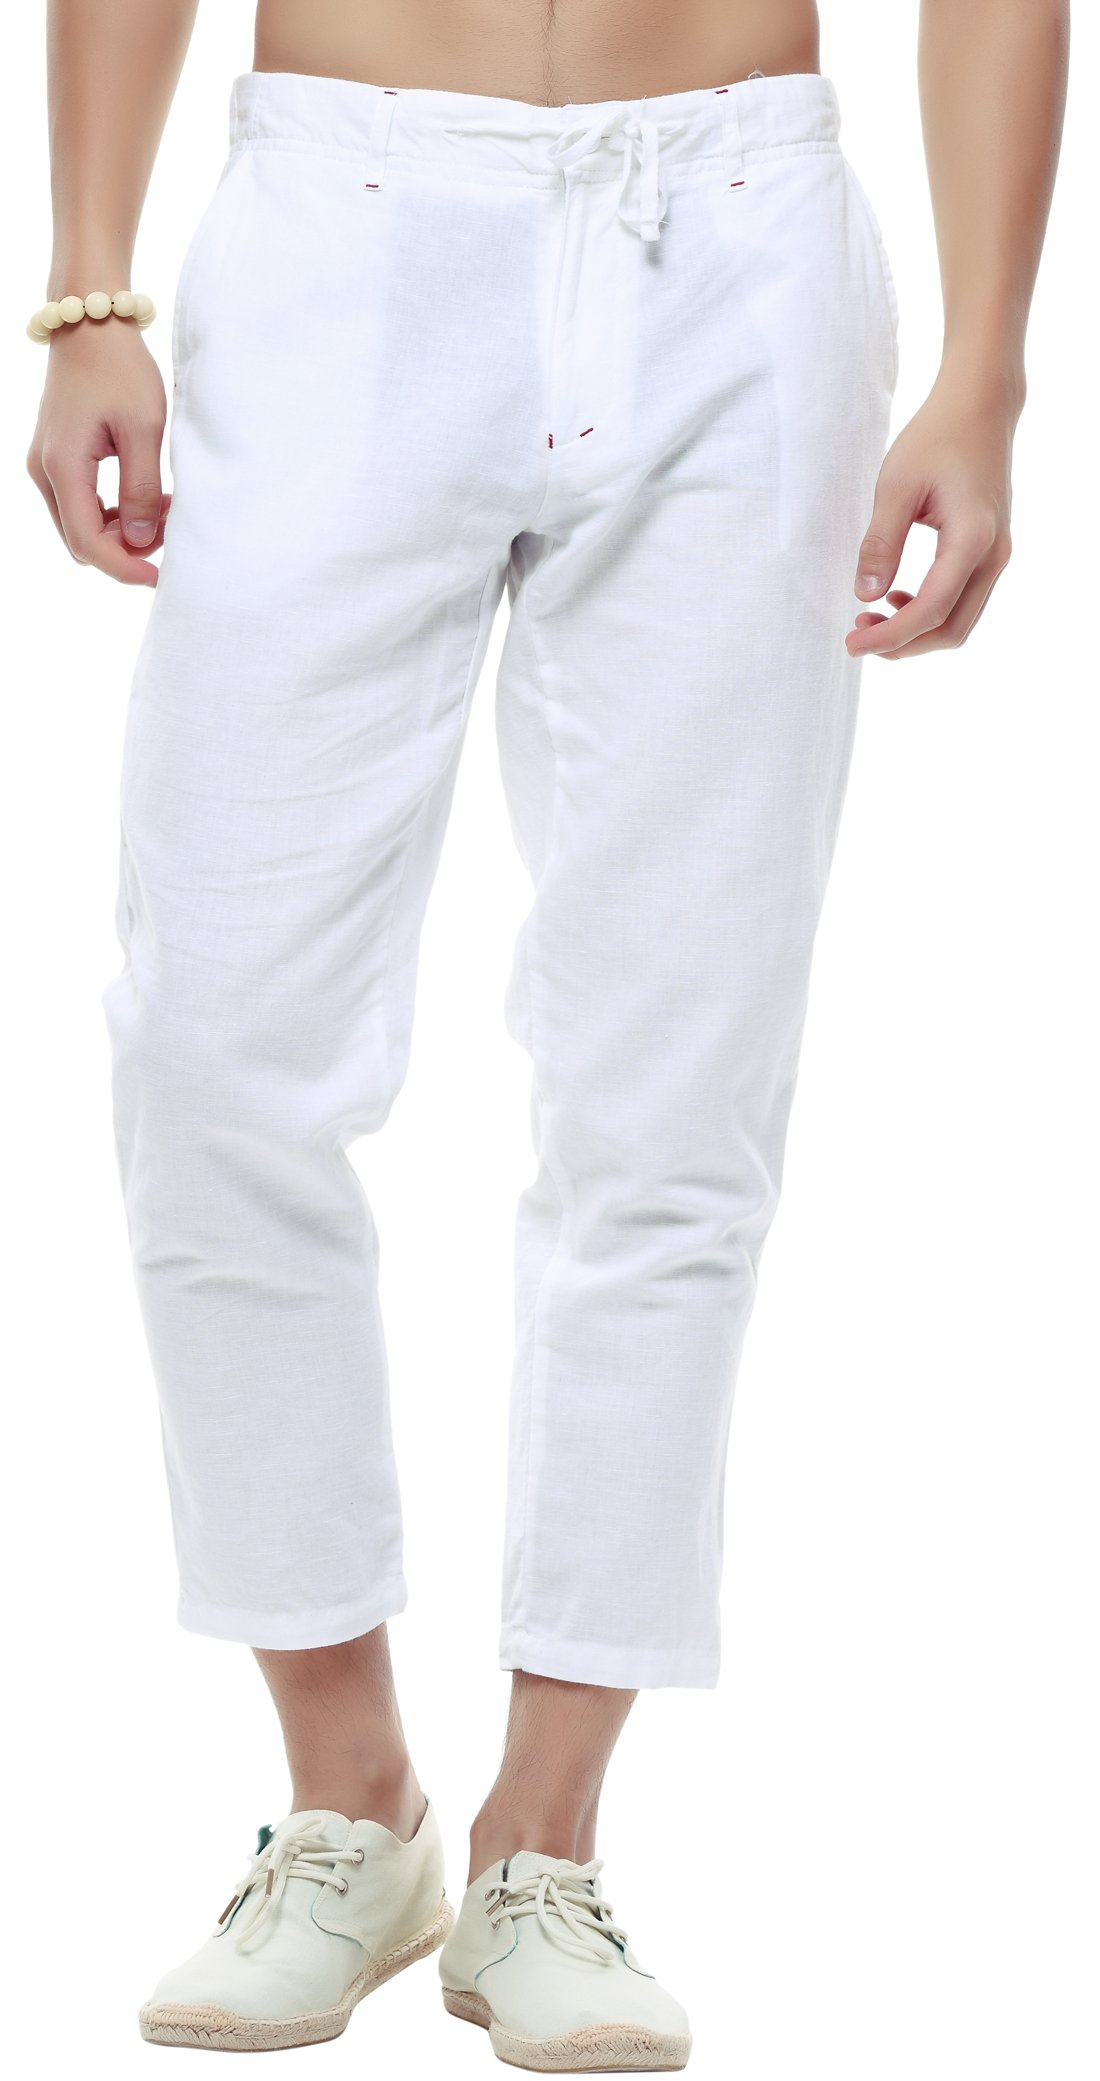 utcoco Men's Classic Drawstring Waist Tapered Flat-Front Linen Capris (Large, White)